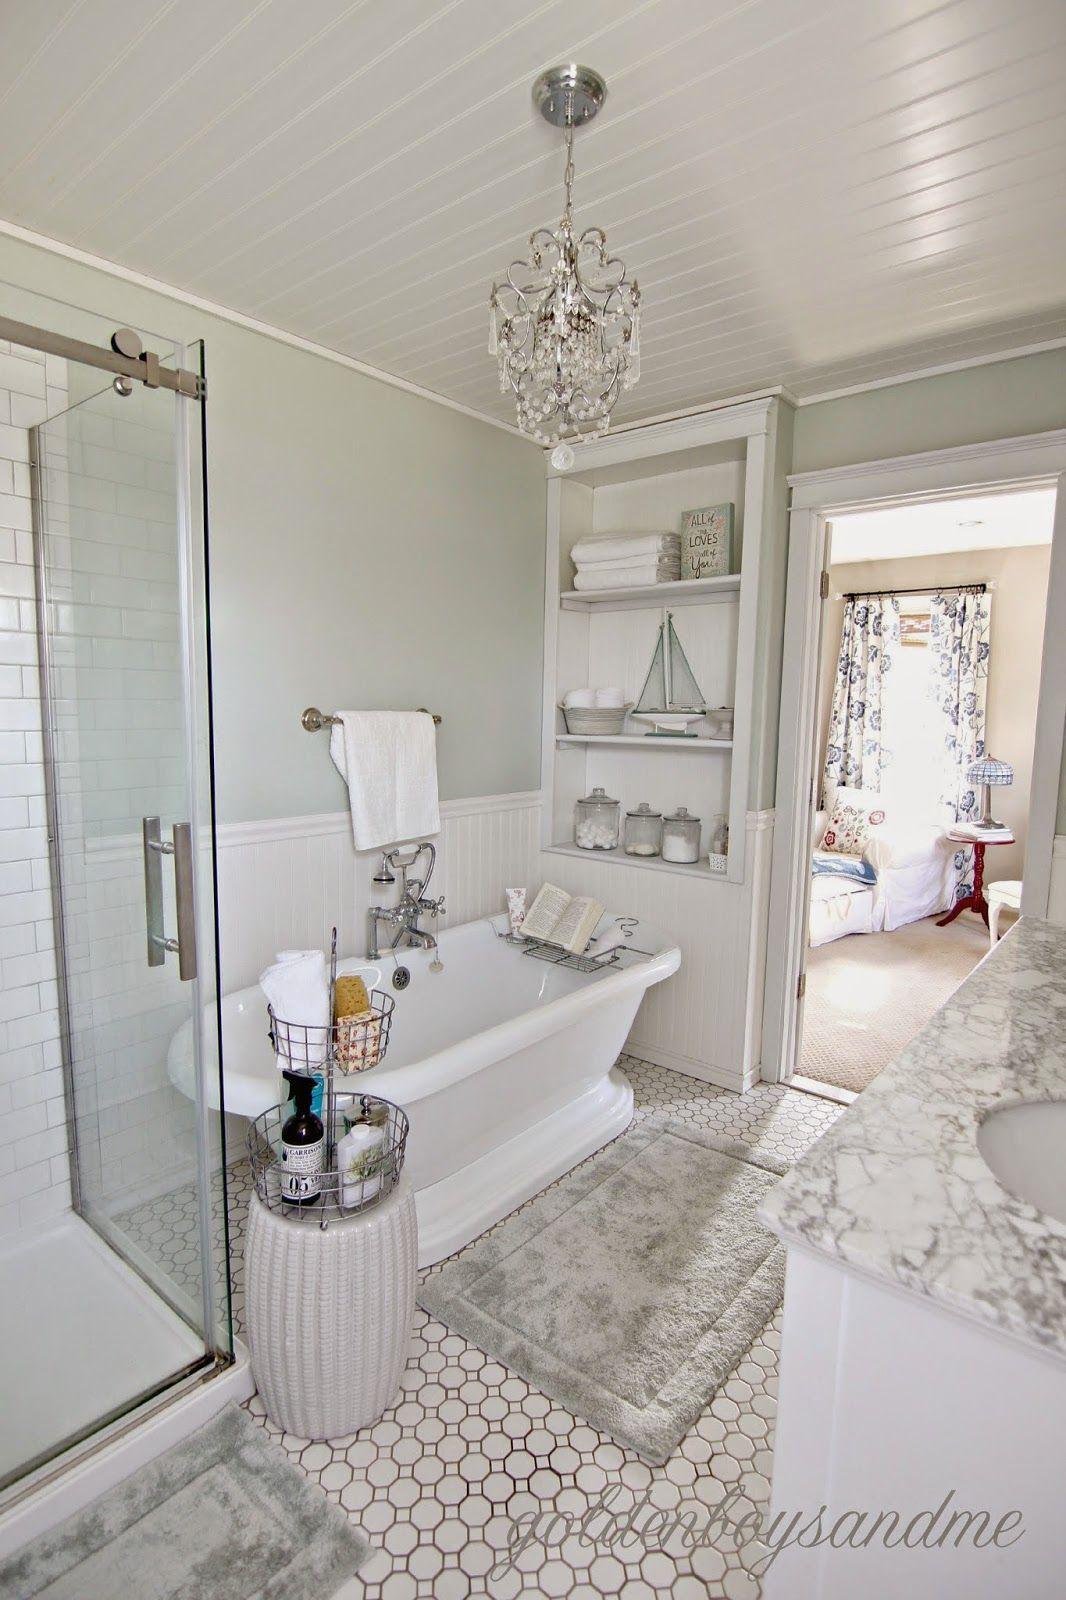 kreative bad kronleuchter ideen f r moderne innenraum das crystal bad kronleuchter war die ideen. Black Bedroom Furniture Sets. Home Design Ideas